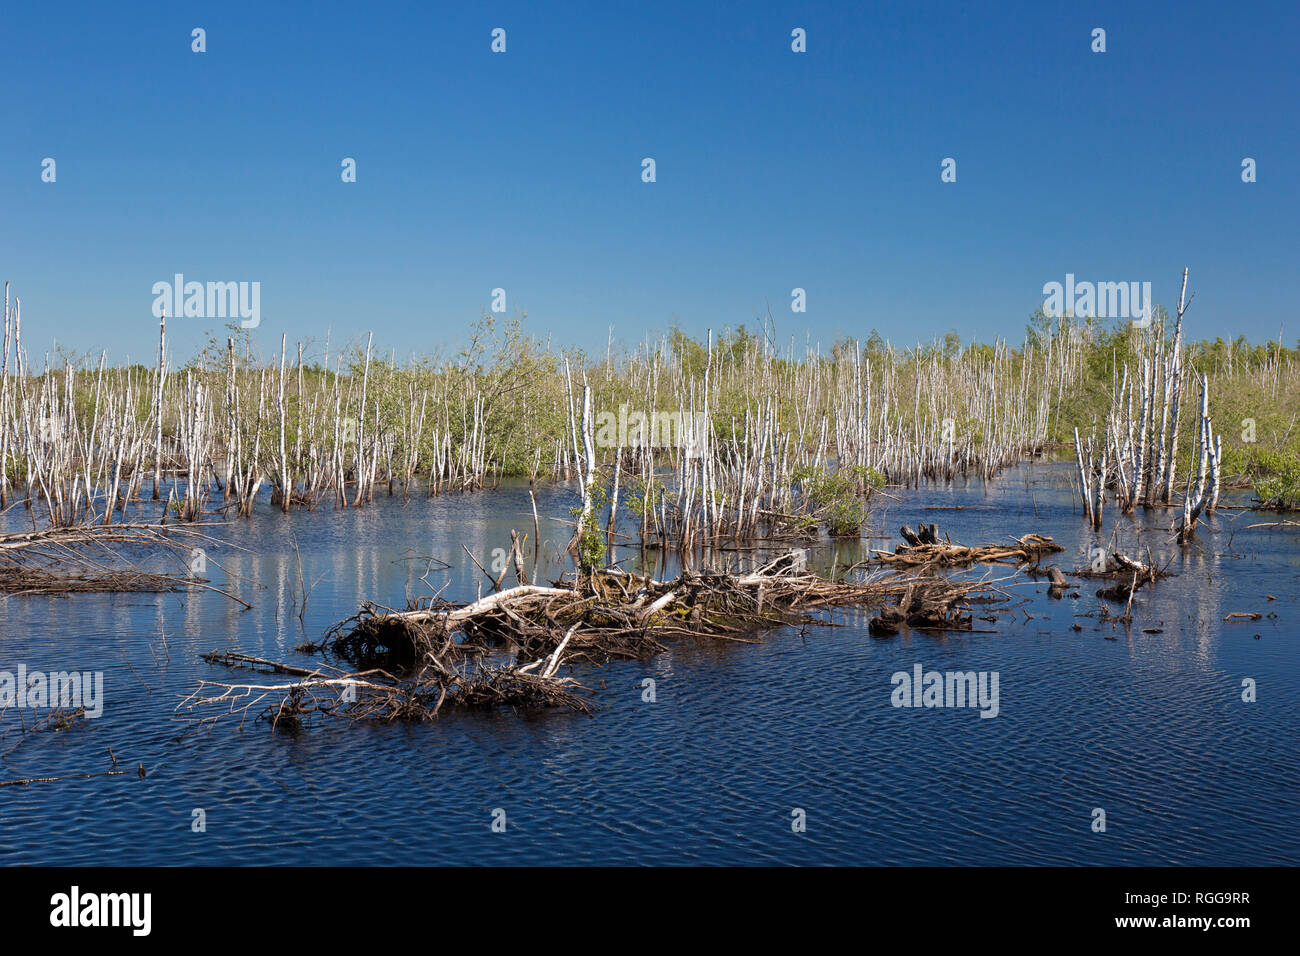 Dead birch trees in lake in nature reserve Totes Moor / Toten Moor, raised bog near Neustadt am Rübenberge, Niedersachsen / Lower Saxony, Germany - Stock Image